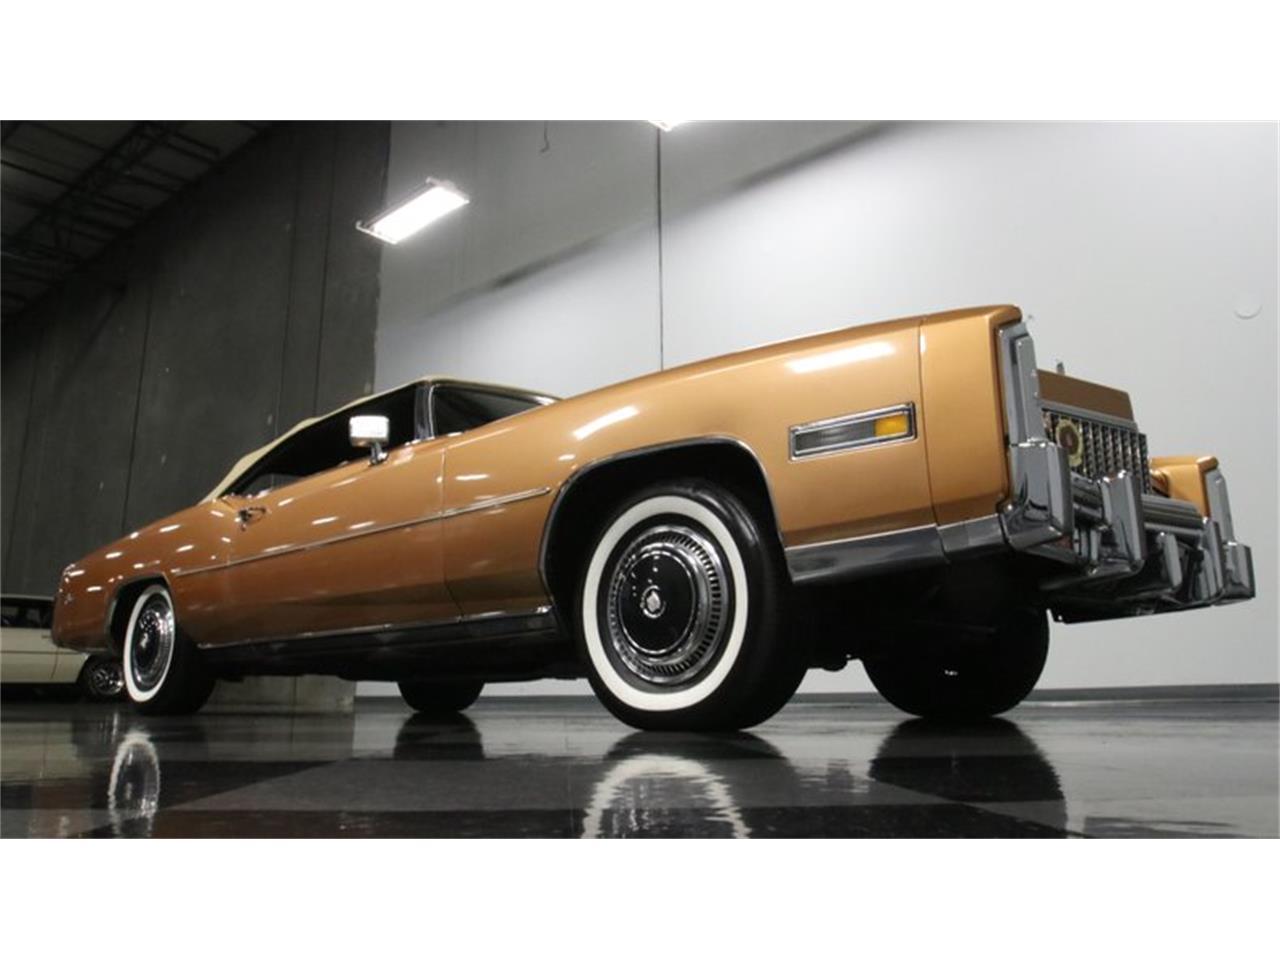 1976 Cadillac Eldorado (CC-1410799) for sale in Lithia Springs, Georgia